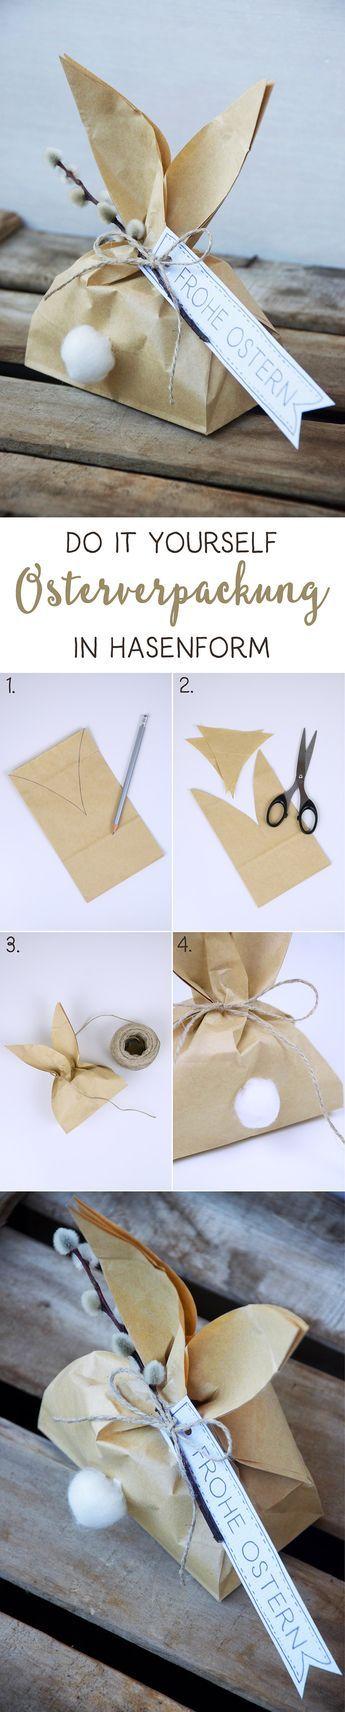 DIY // Easter Bunny Wrap – Instructies #ostern #diy # Gift Wrap  – Geschenke